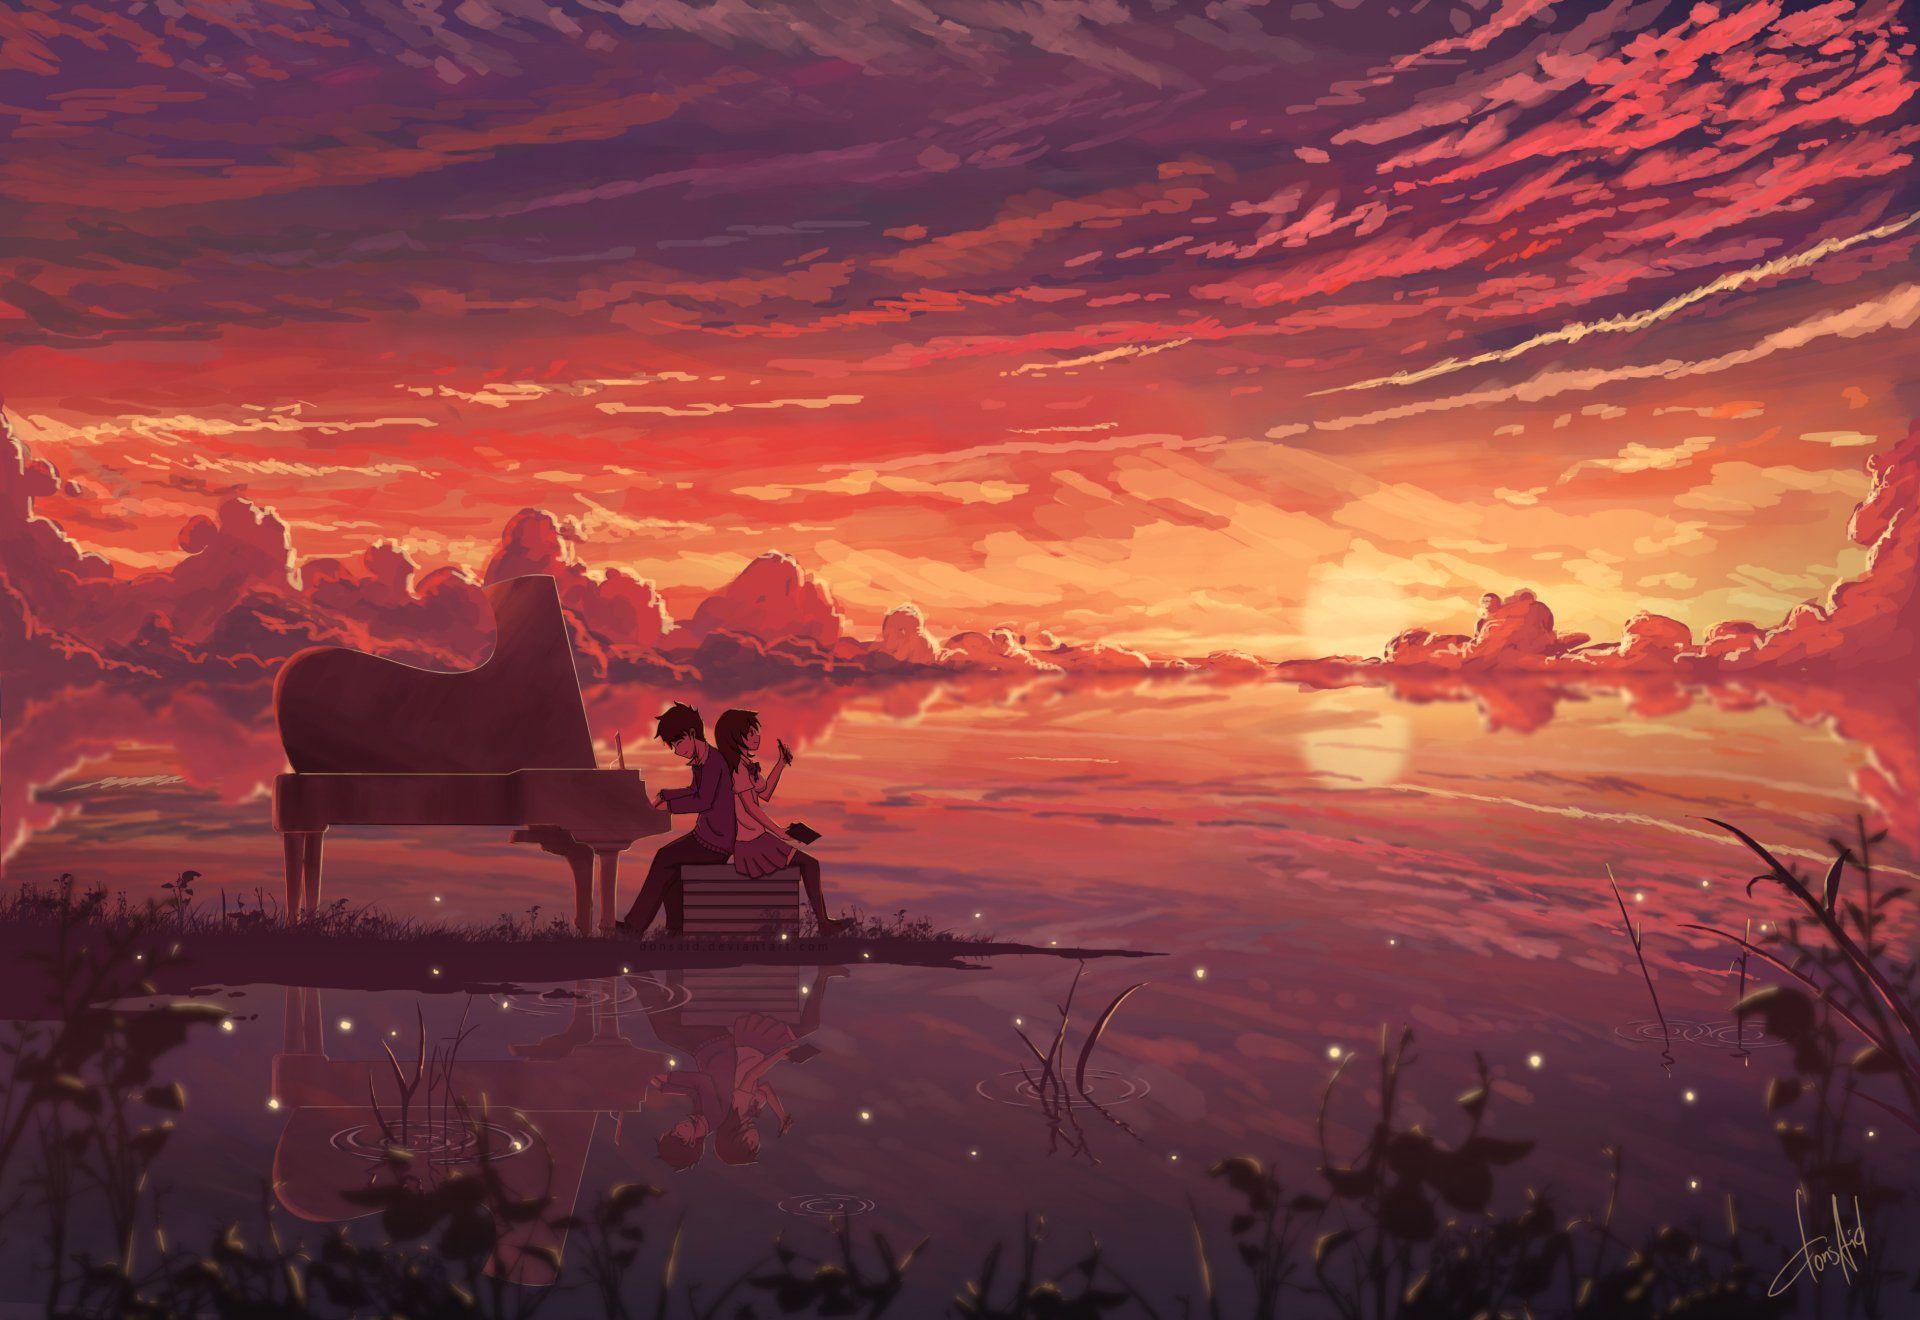 Anime Original Piano Girl Boy Sunset Sky Cloud Headphones Anime Reflection Orange Horizon Wallpaper Anime Scenery Anime Wallpaper Art Wallpaper